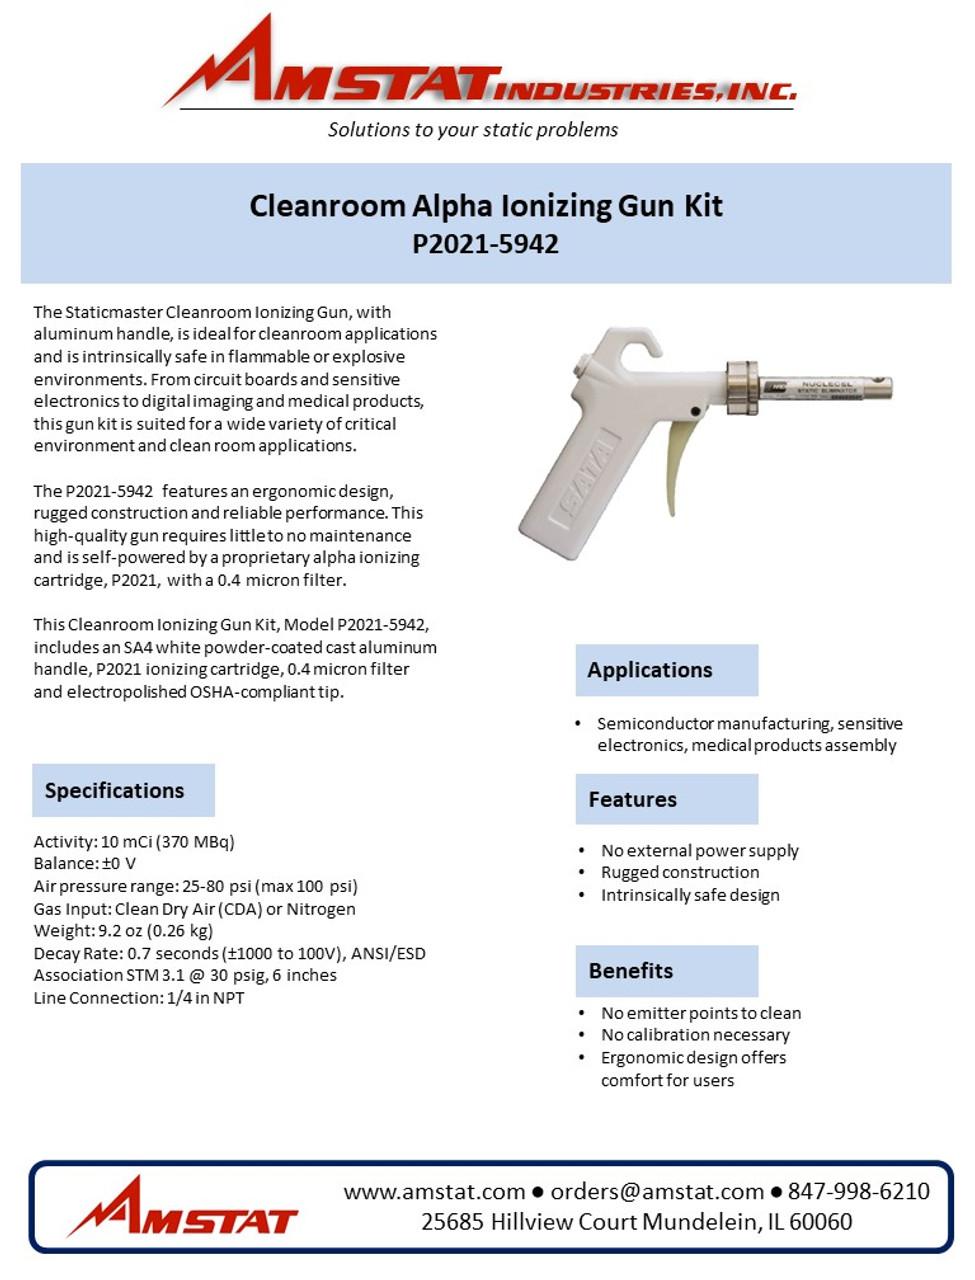 Cleanroom Alpha Ionizing Gun Kit - Aluminum Handle